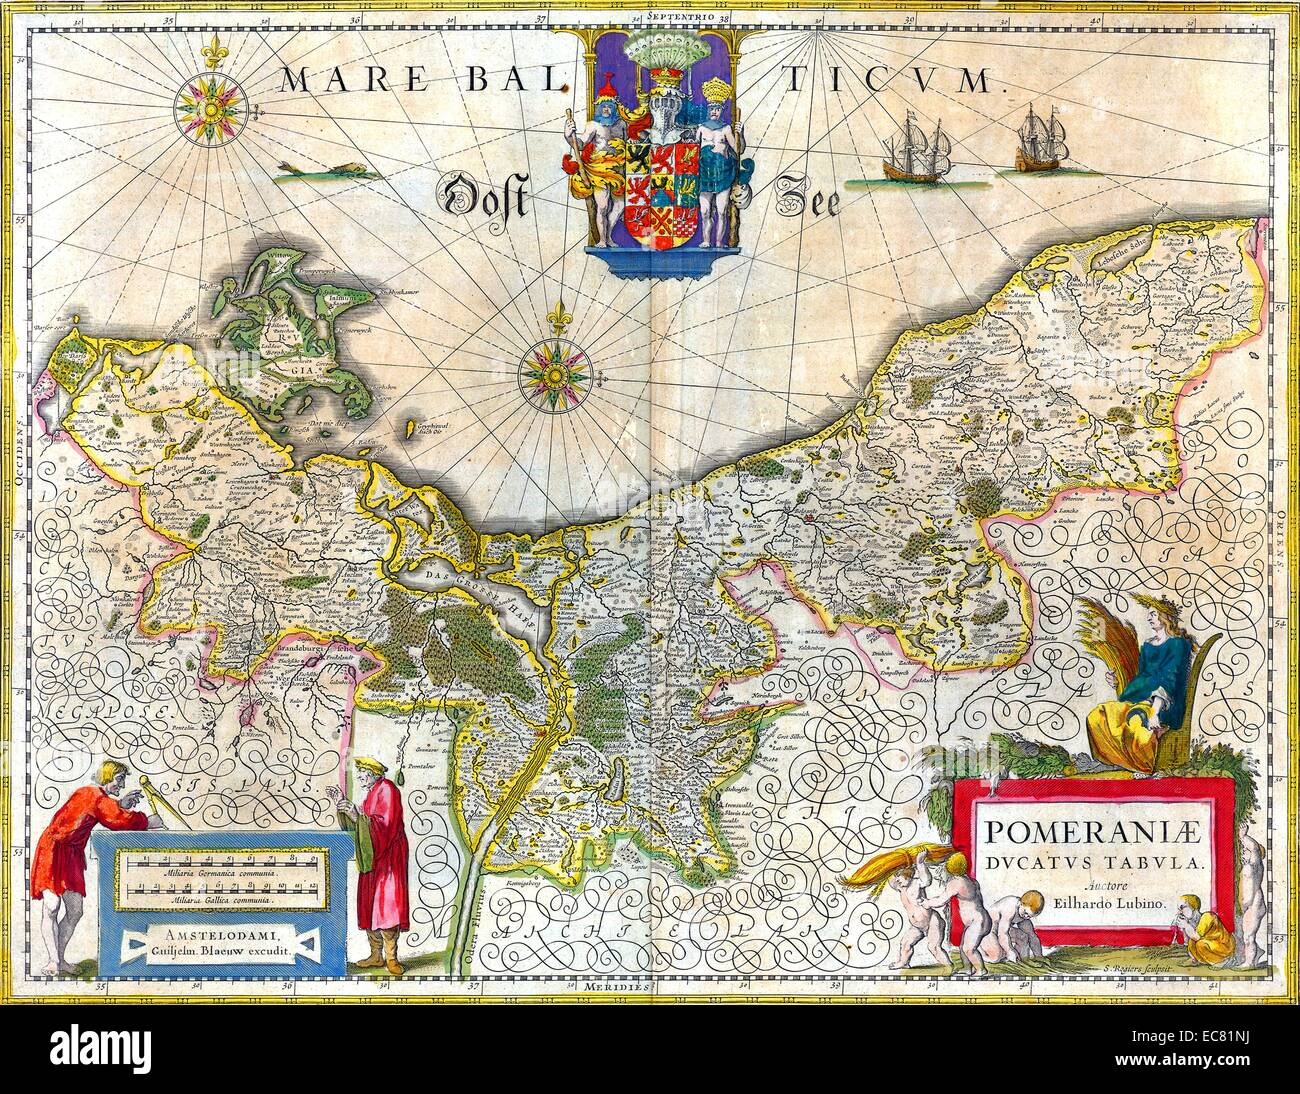 Mapa del histórico ducado de Pomerania. Fecha siglo xvii Imagen De Stock